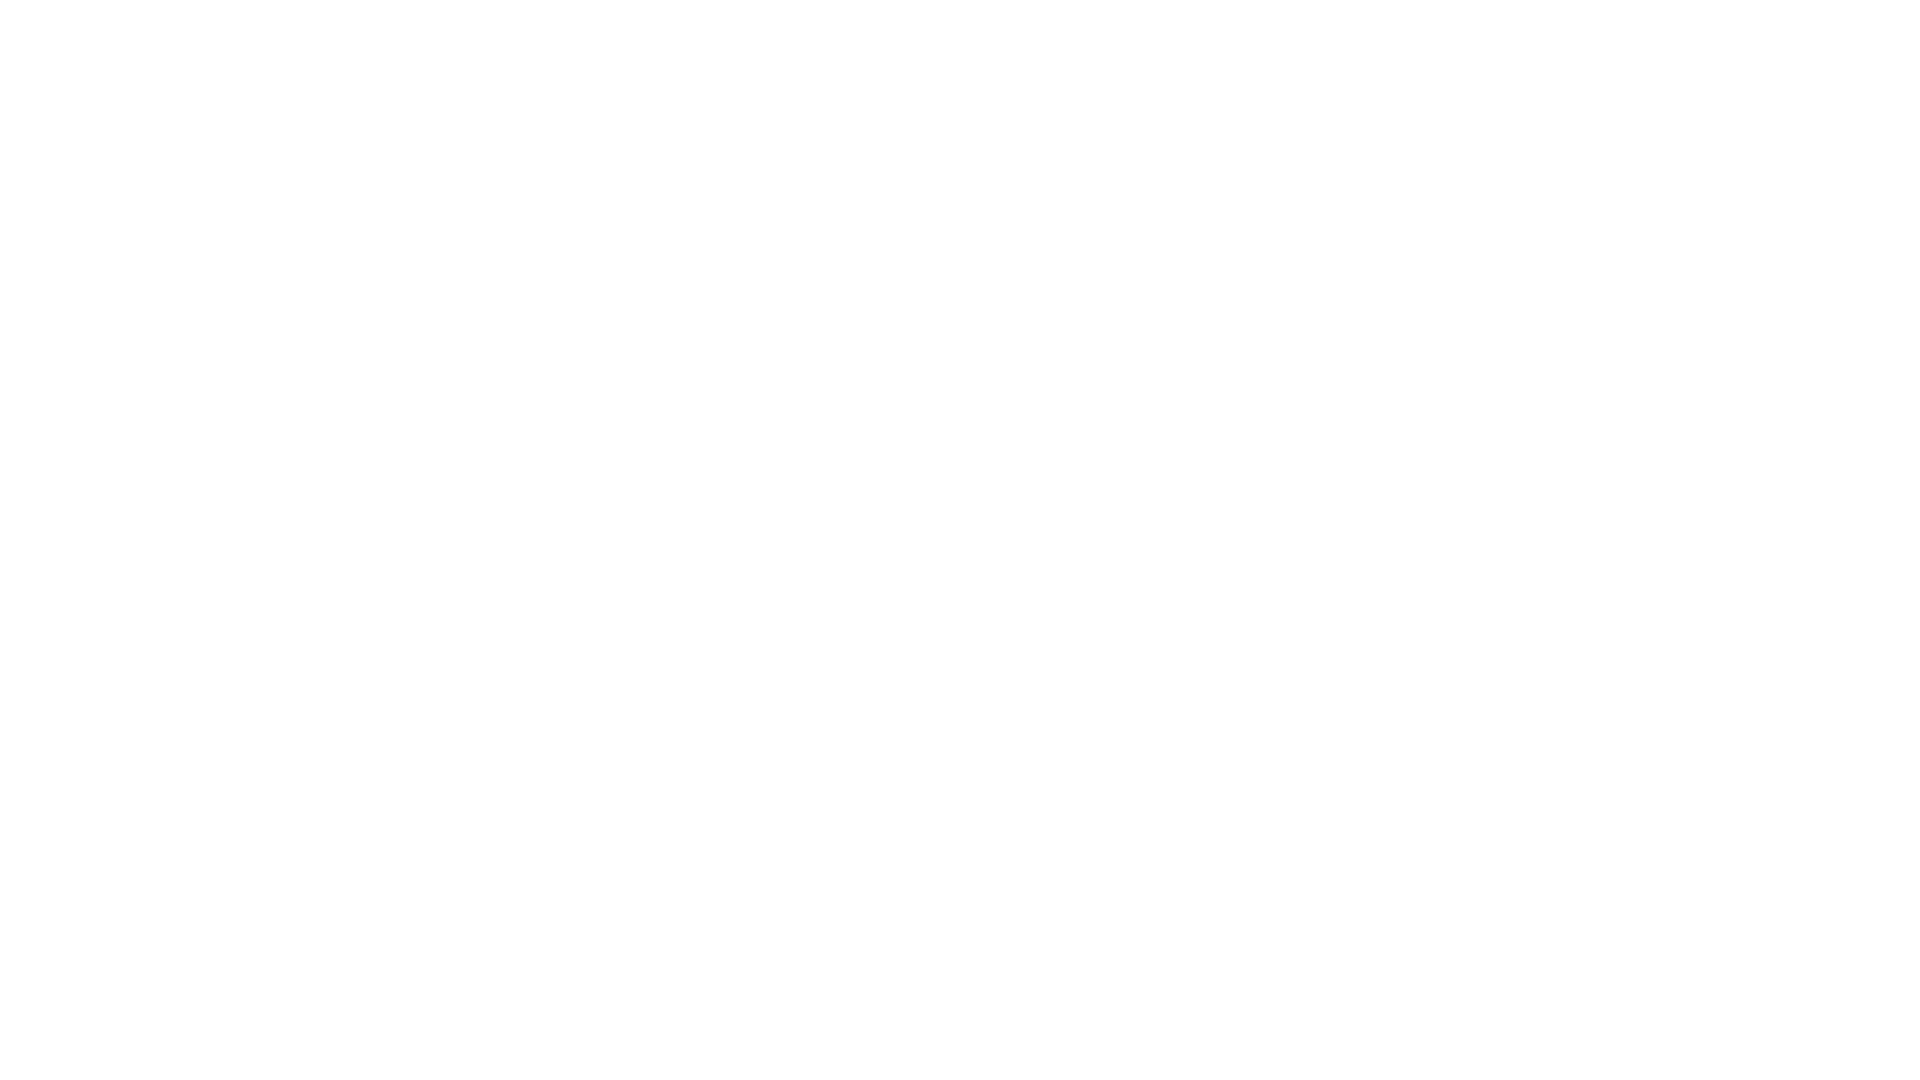 HEADLINE: Community Health white transparent logo